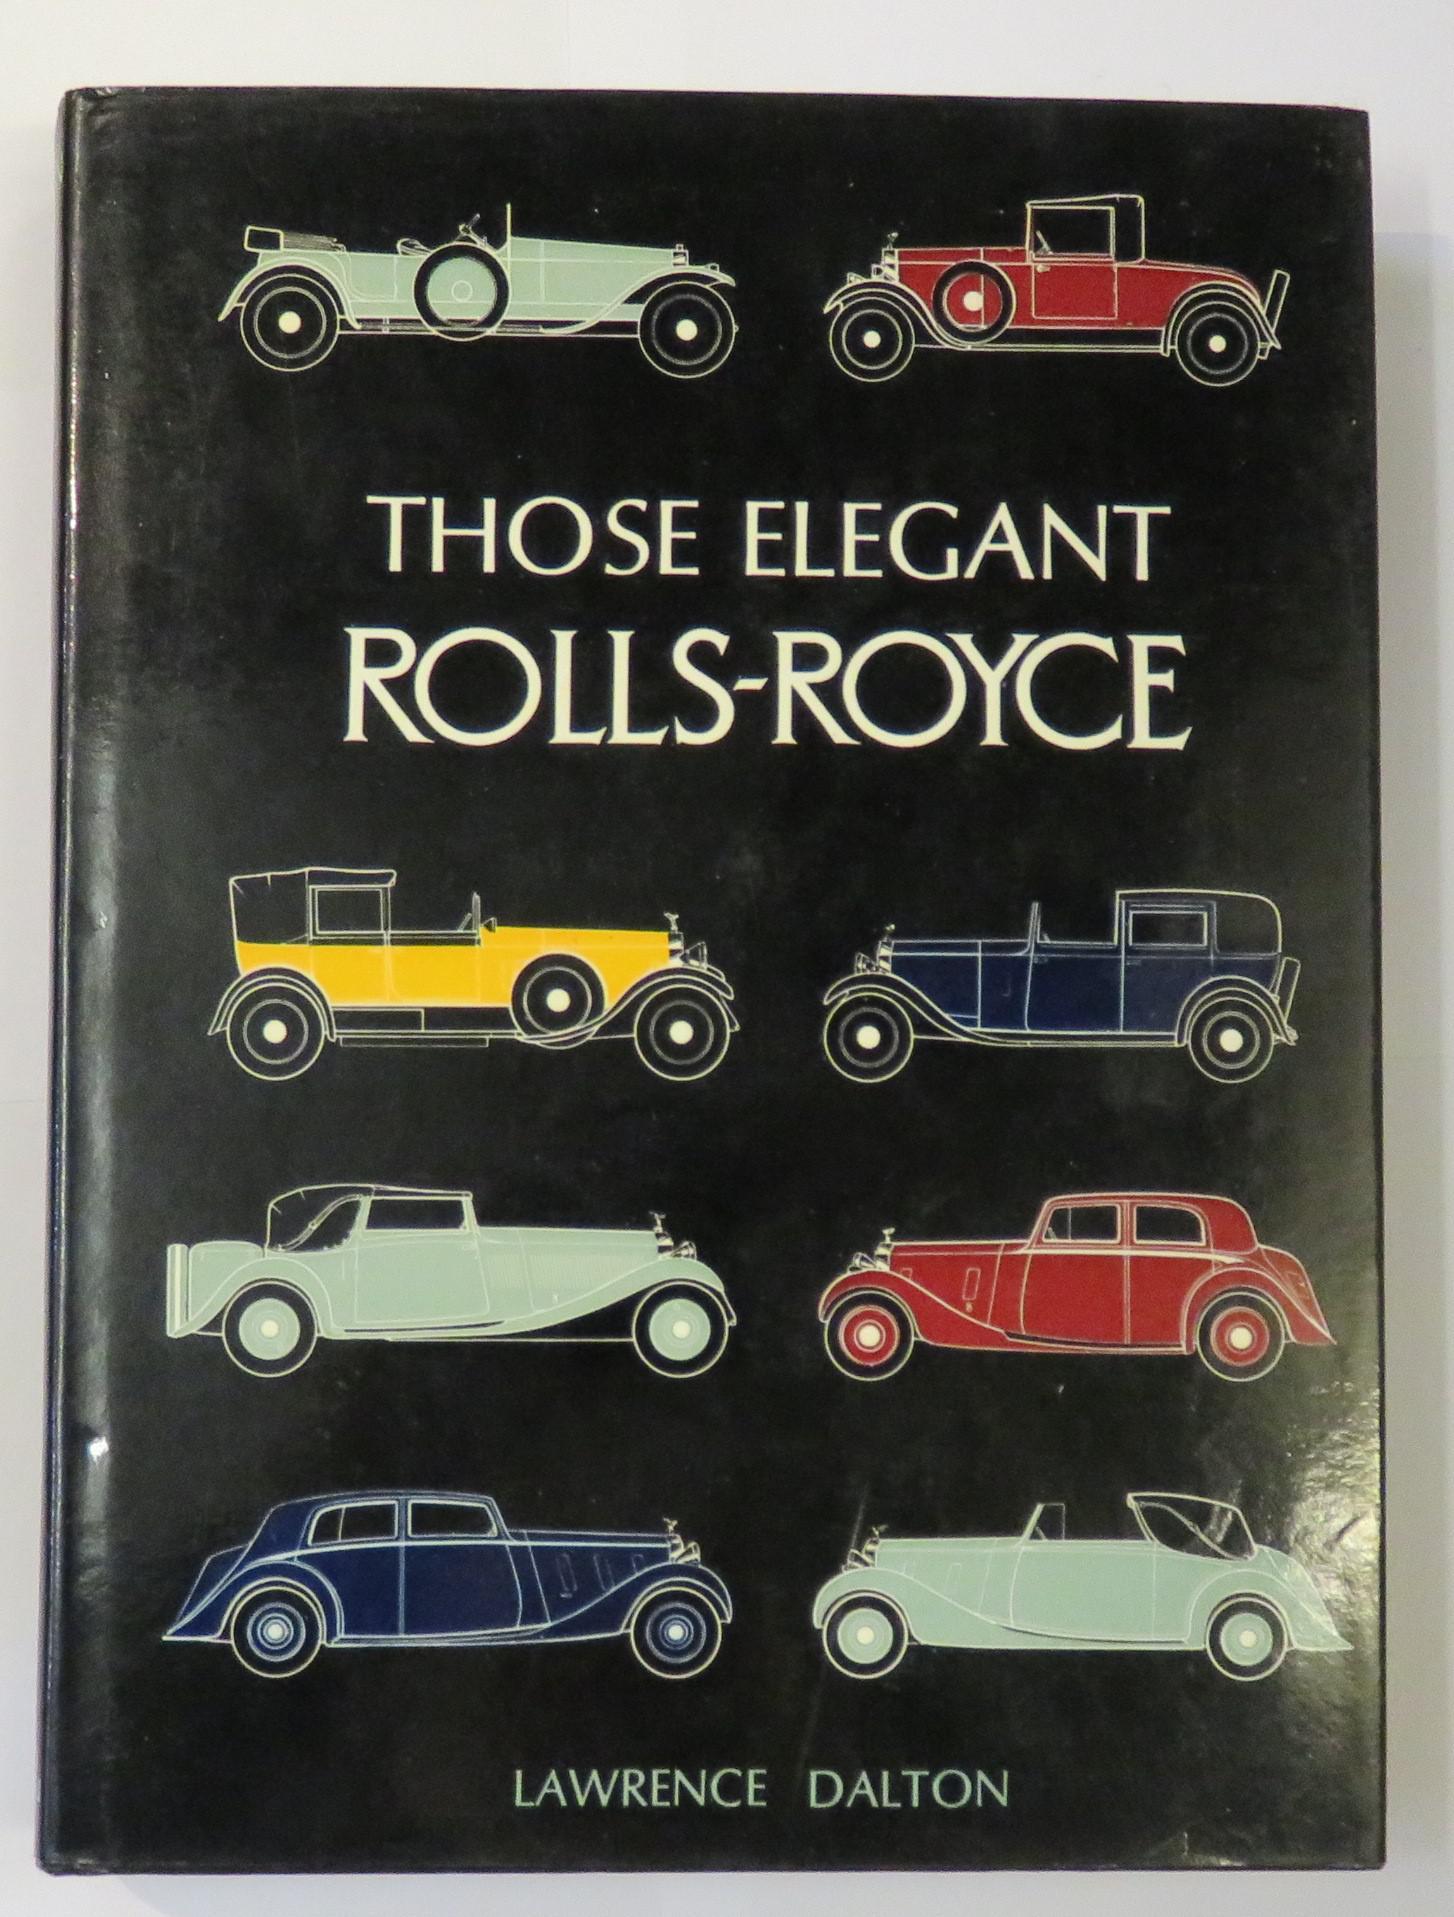 Those Elegant Rolls-Royce